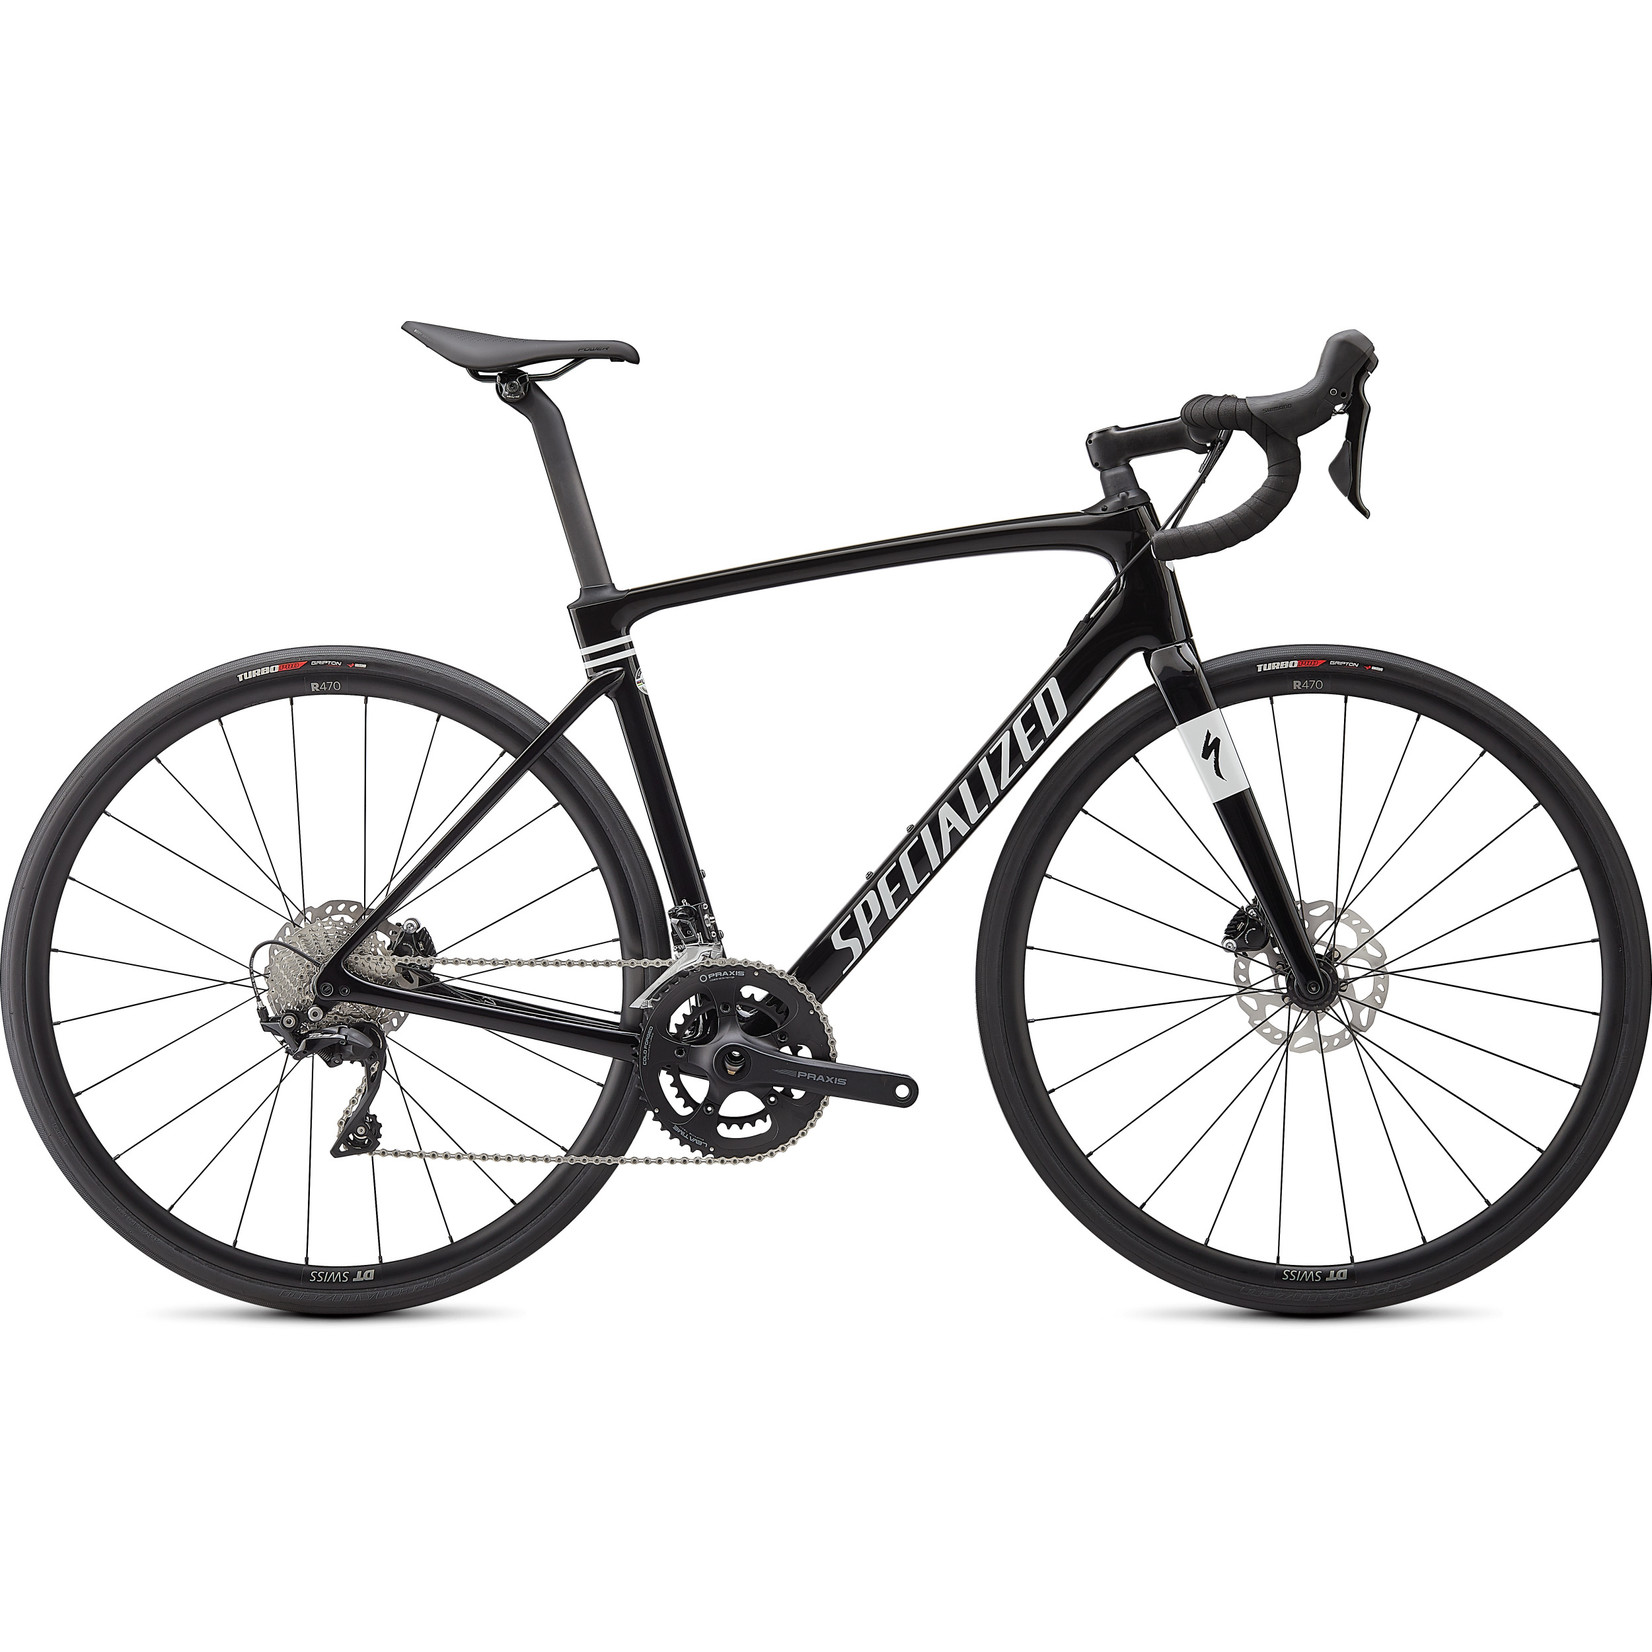 Specialized Roubaix Sport - Specialized Tarmac Black/Met White Silver 52